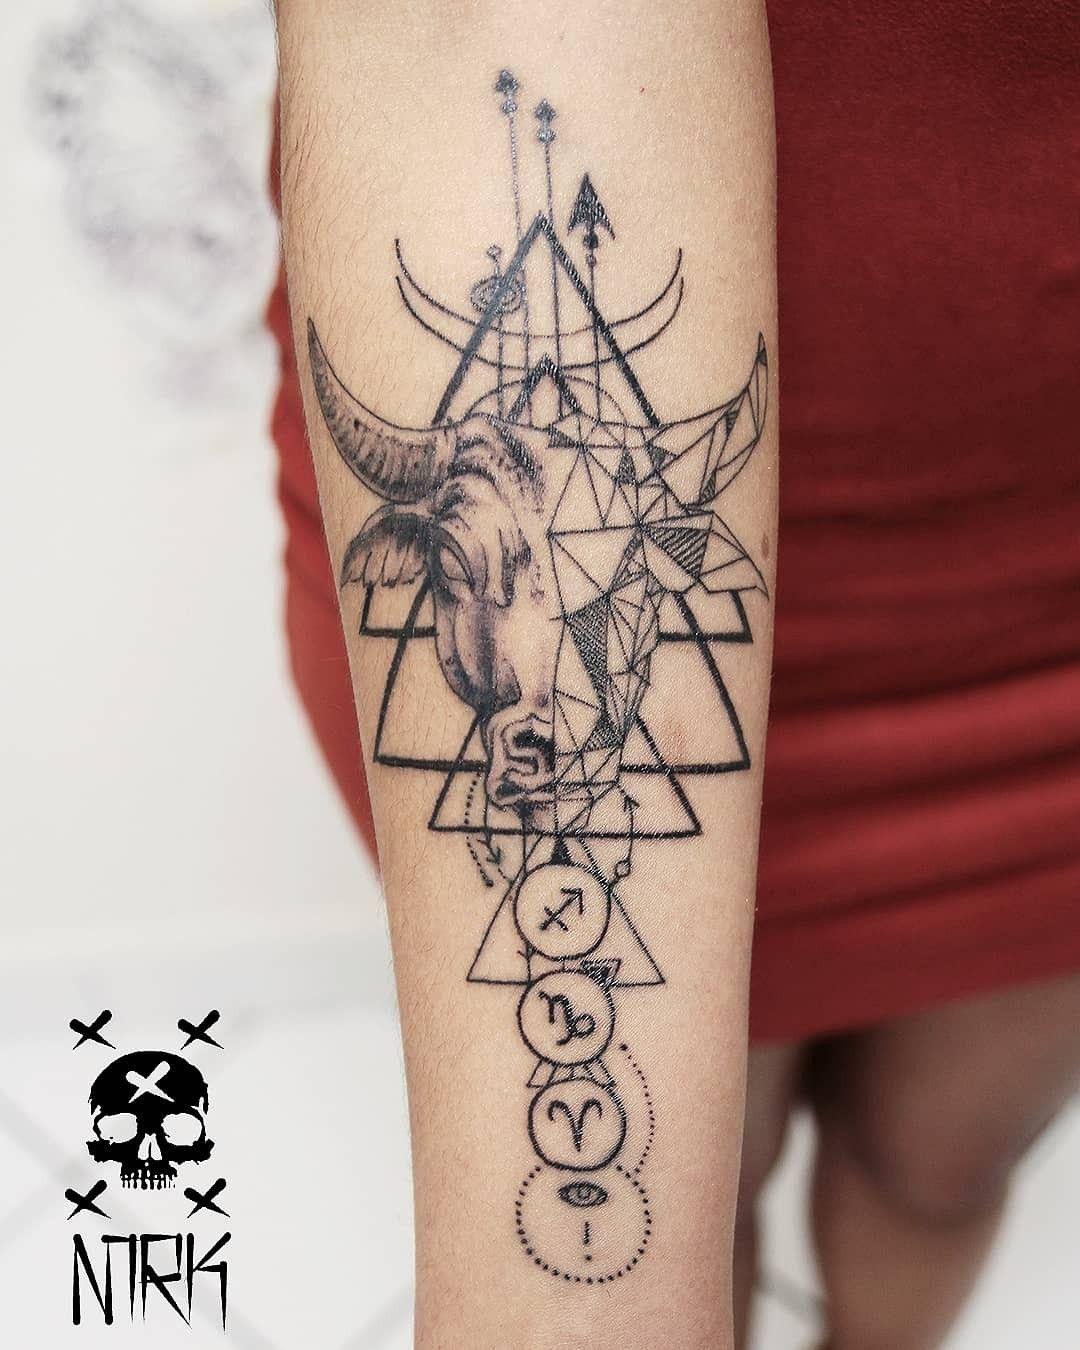 Small Simple Bull Tattoo Designs (197)